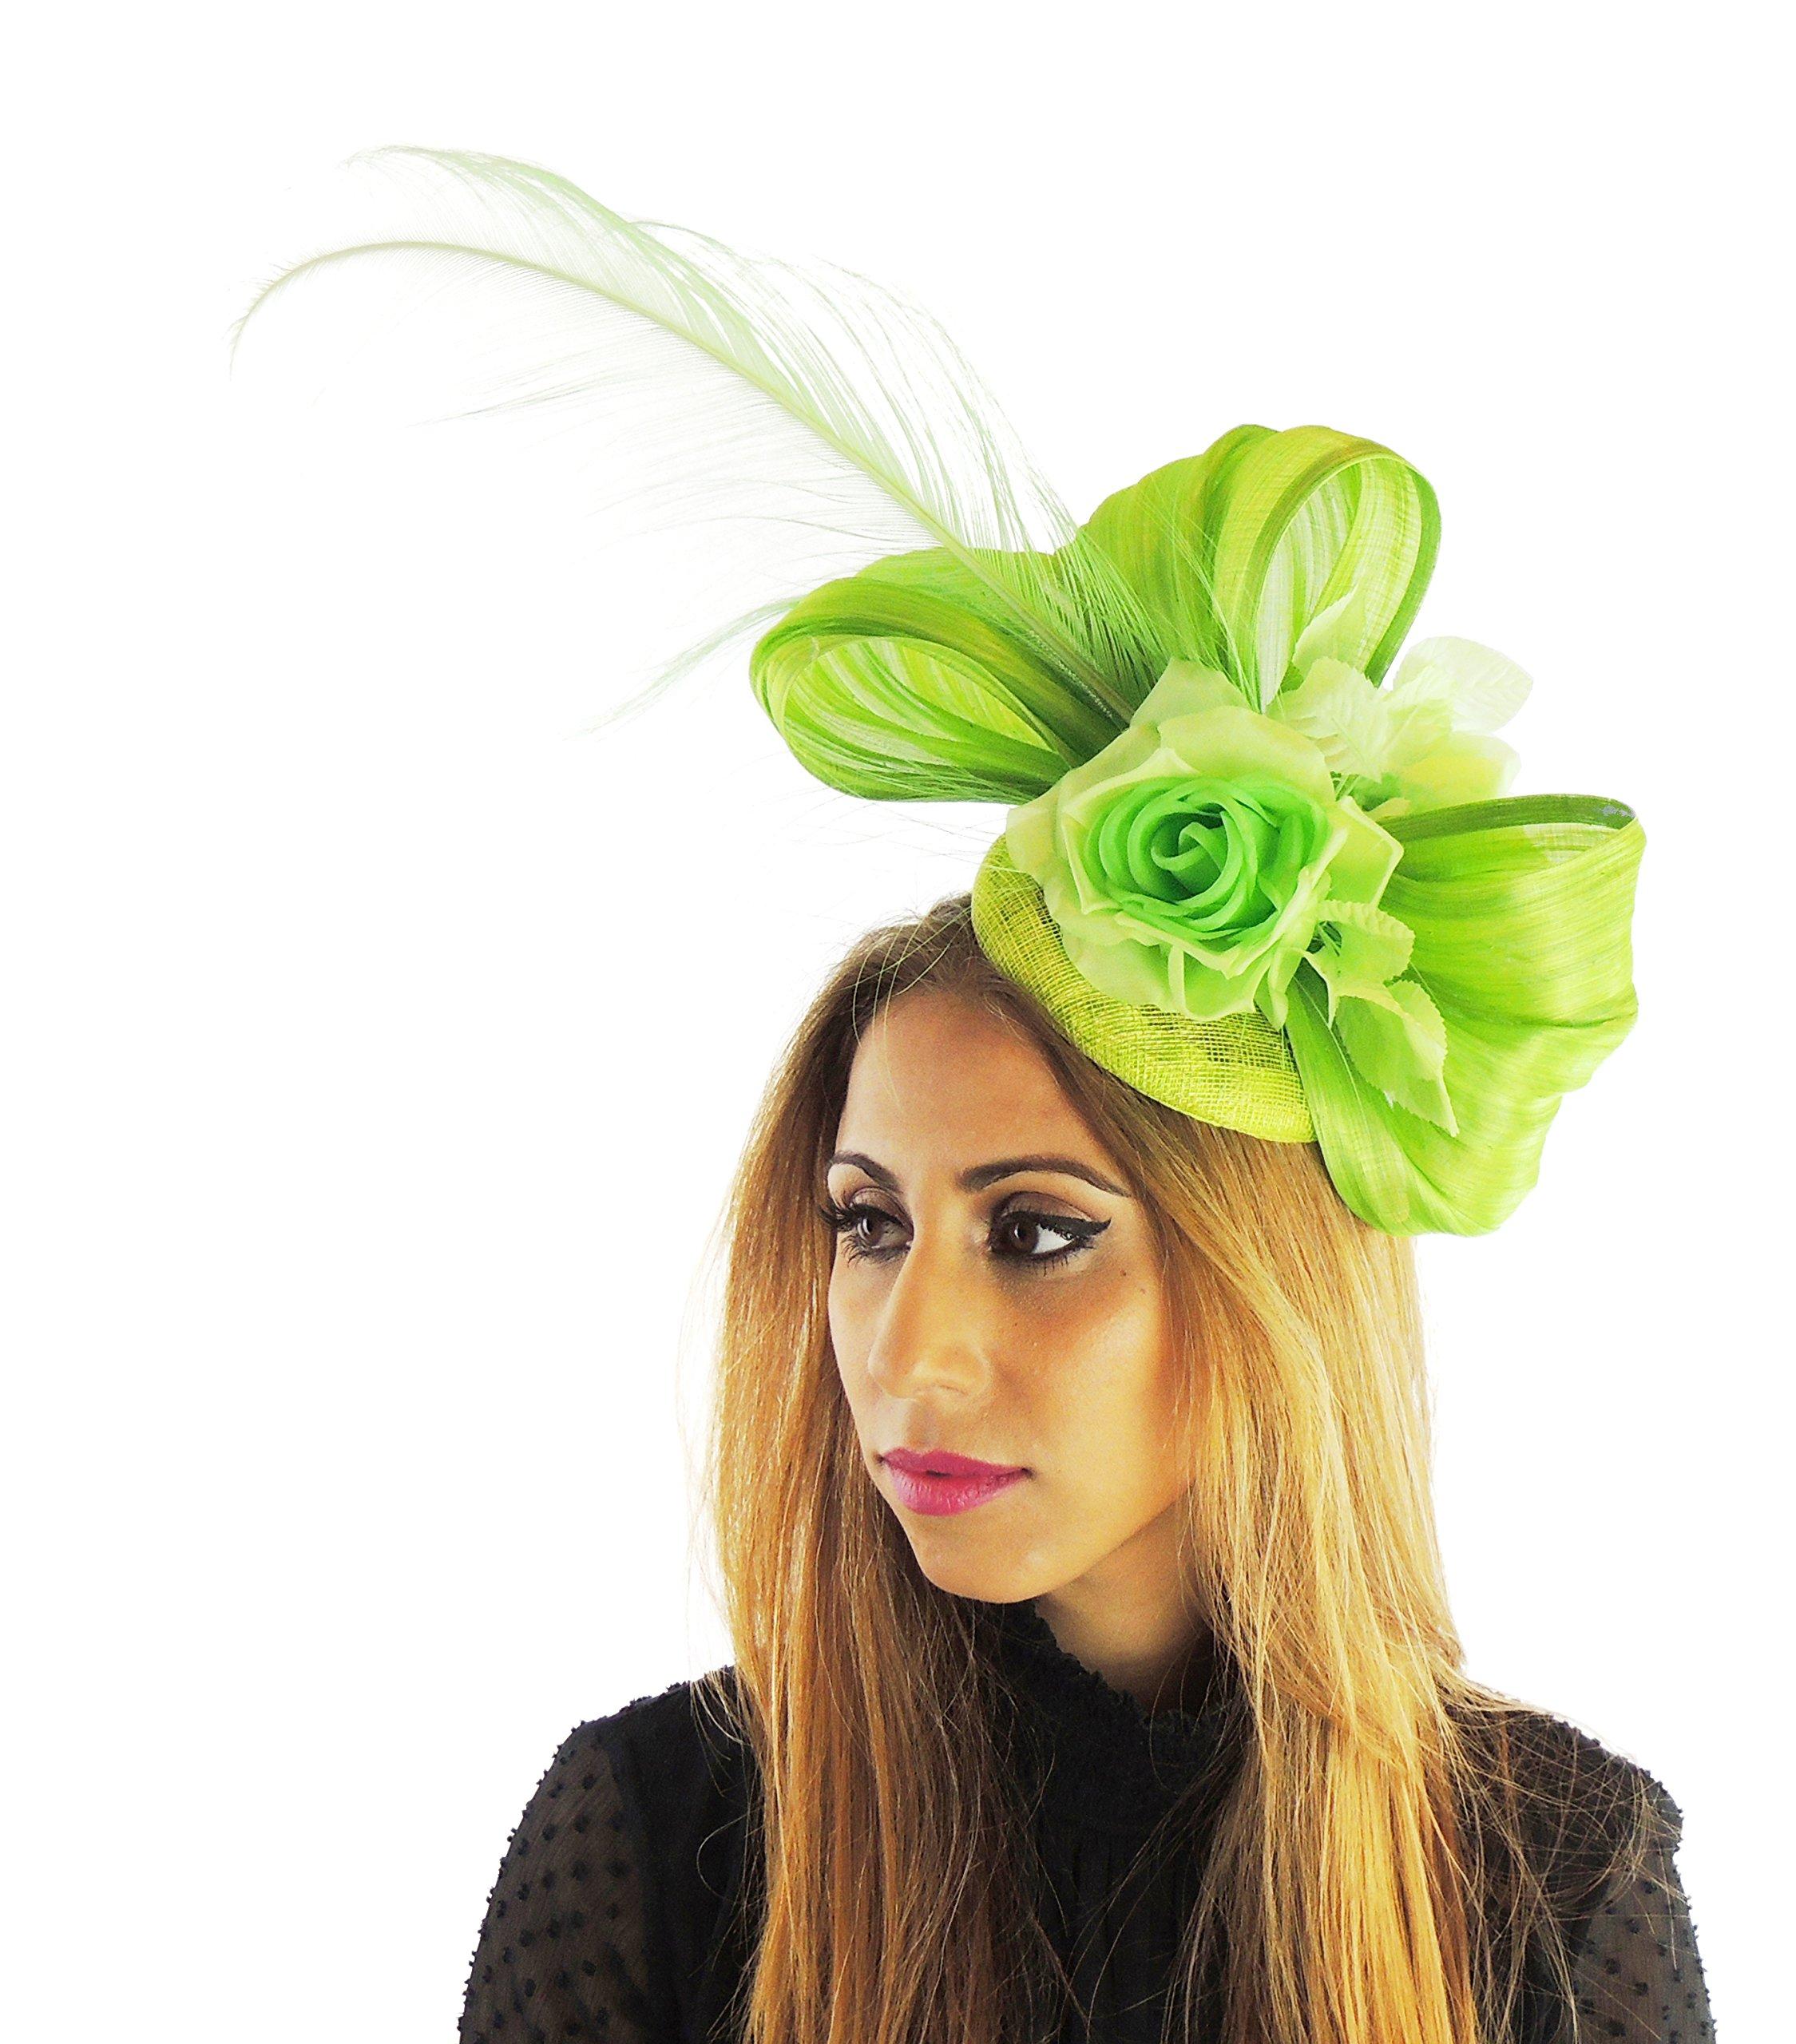 Hats By Cressida Silk Sinamay & Silk Flower Elegant Ladies Ascot Wedding Fascinator Hat Lime